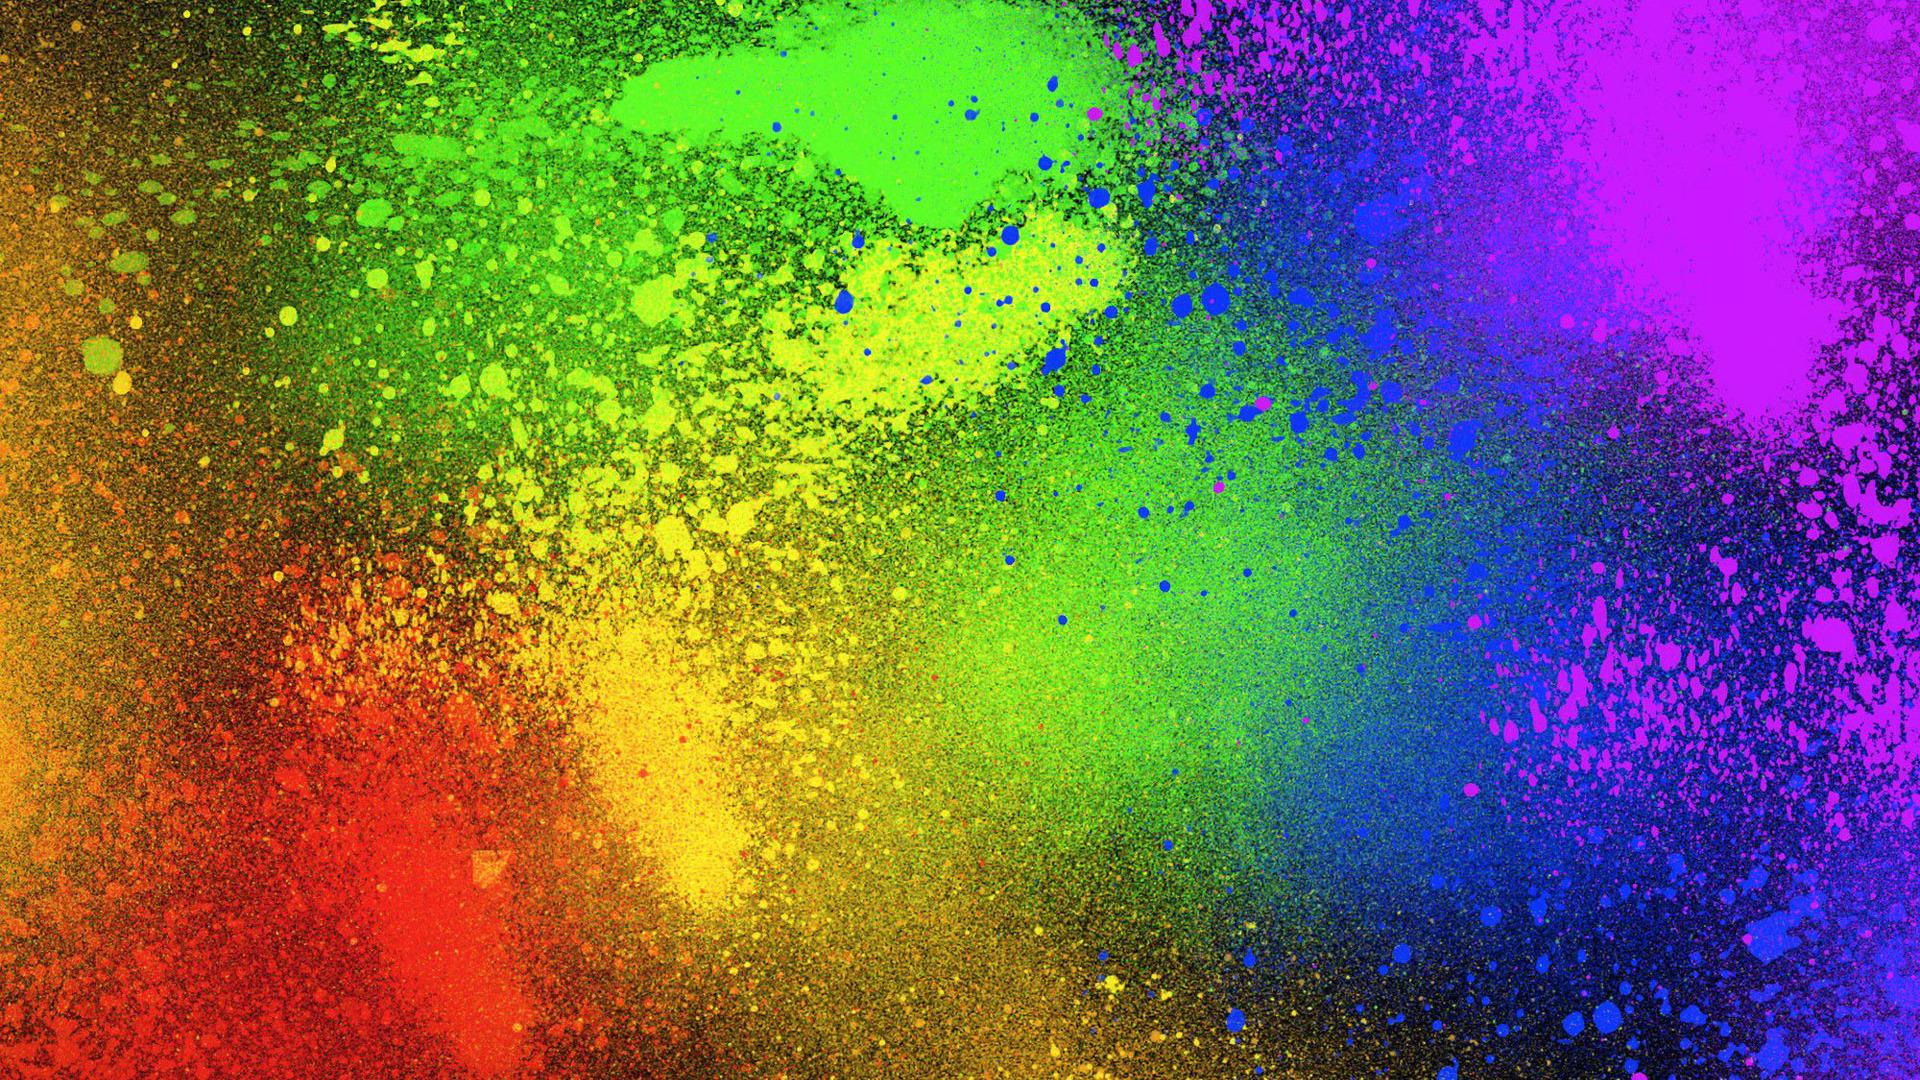 splash of color hd - photo #22